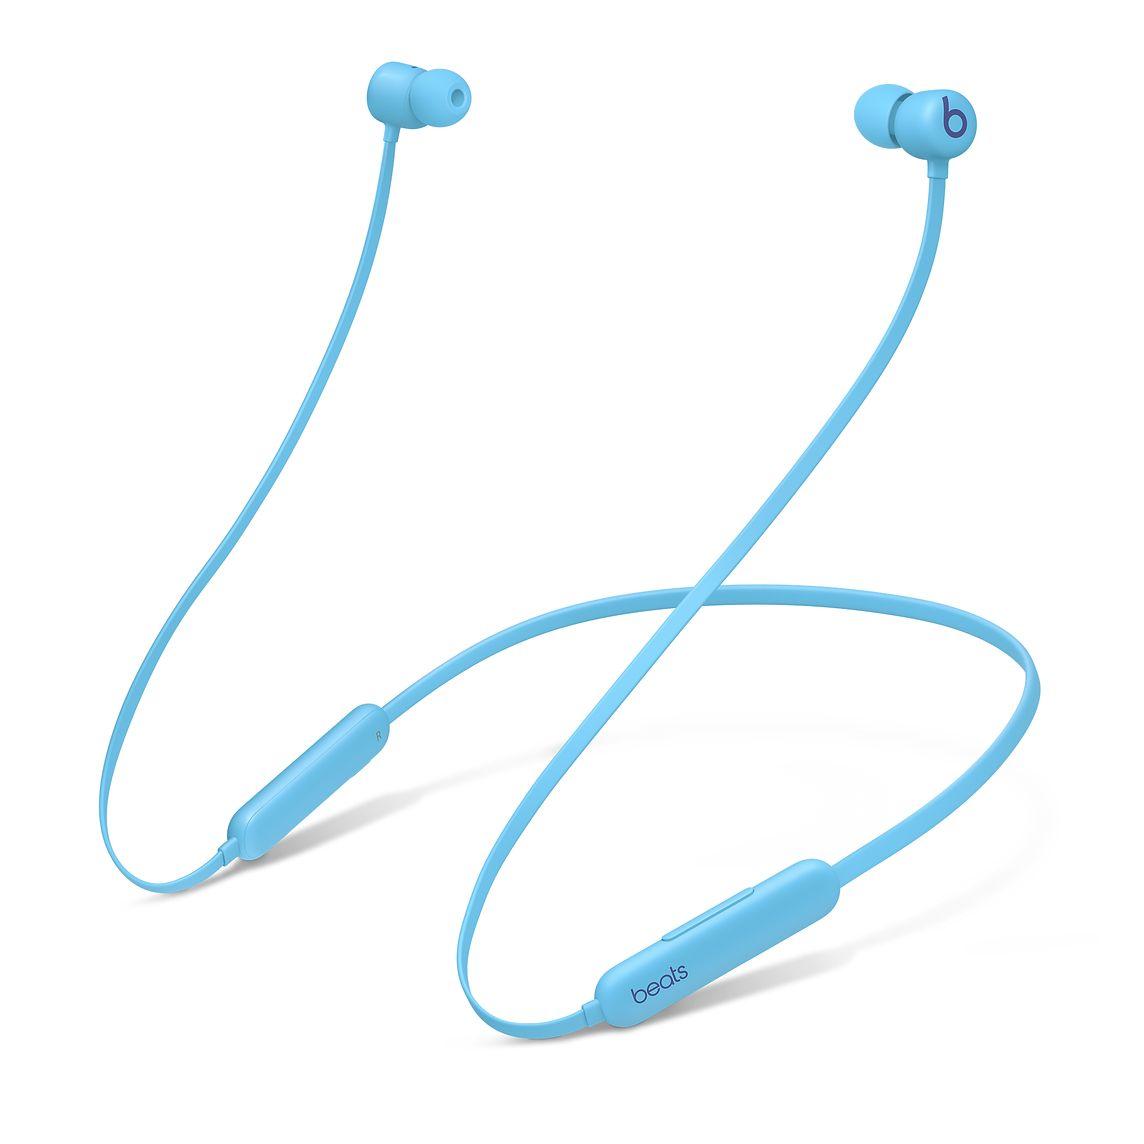 Apple's marketing image showing the Beats Flex wireless earbuds